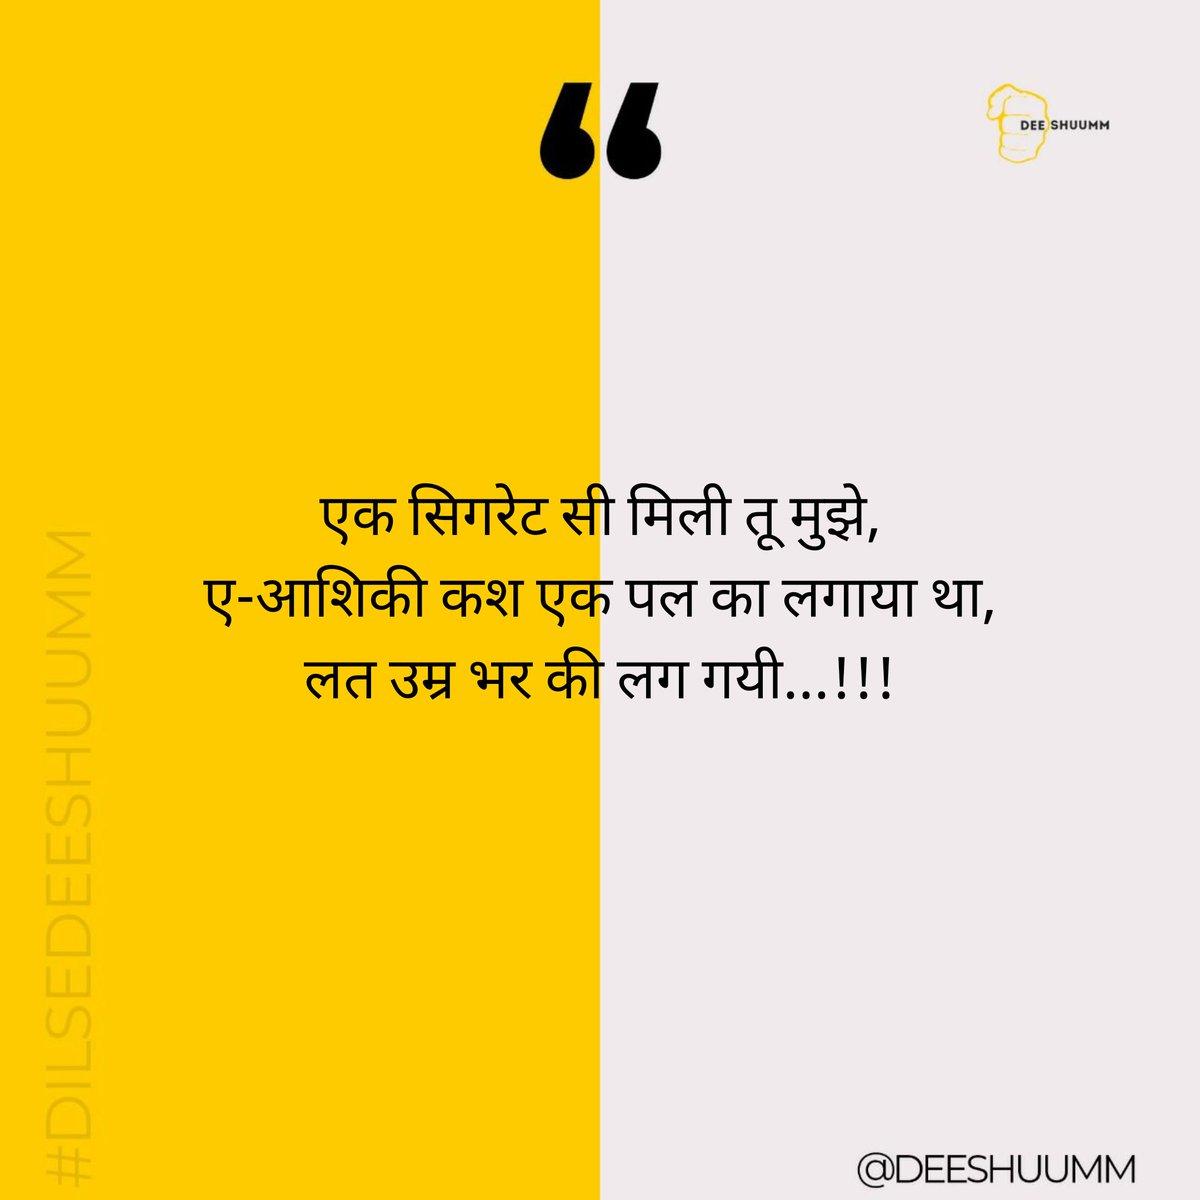 if you feel Connected RT Now! #shayari #love #poetry #urdu #urdupoetry #shayarilover #hindi #shayar #quotes #hindishayari #lovequotes #rekhta #follow #urdushayari #loveshayari #hindipoetry #ishq #poet #like  #shayri #poetrycommunity #instashayari #sad #poem #mohabbat #deeshuummpic.twitter.com/zbad8iLF55